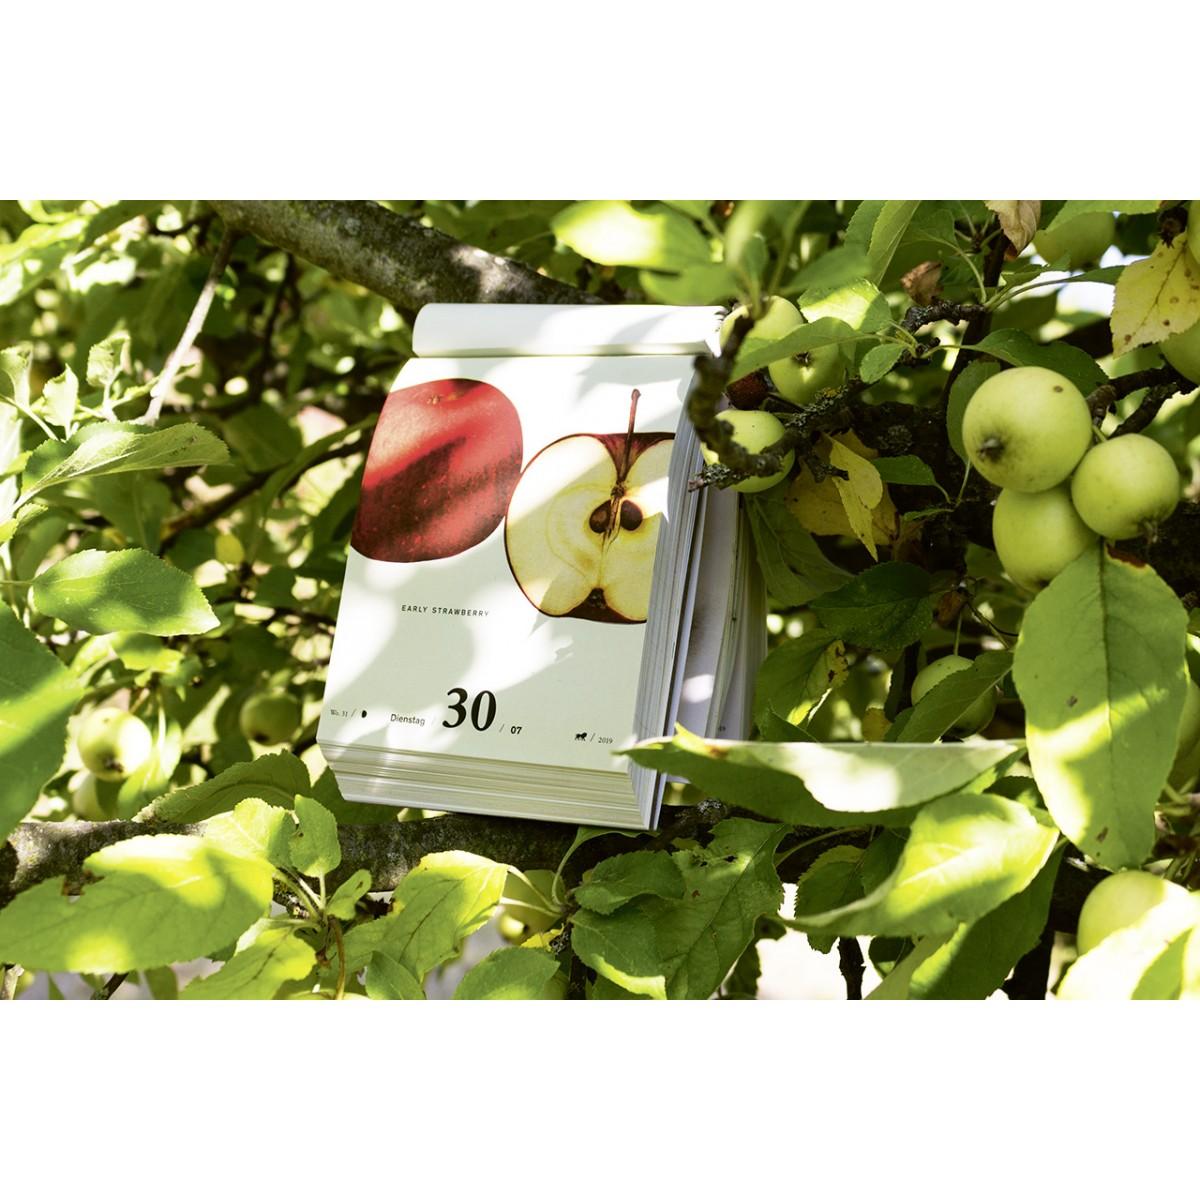 Jochen Rädeker - An Apple a Day 2019 - 365 alte Apfelsorten